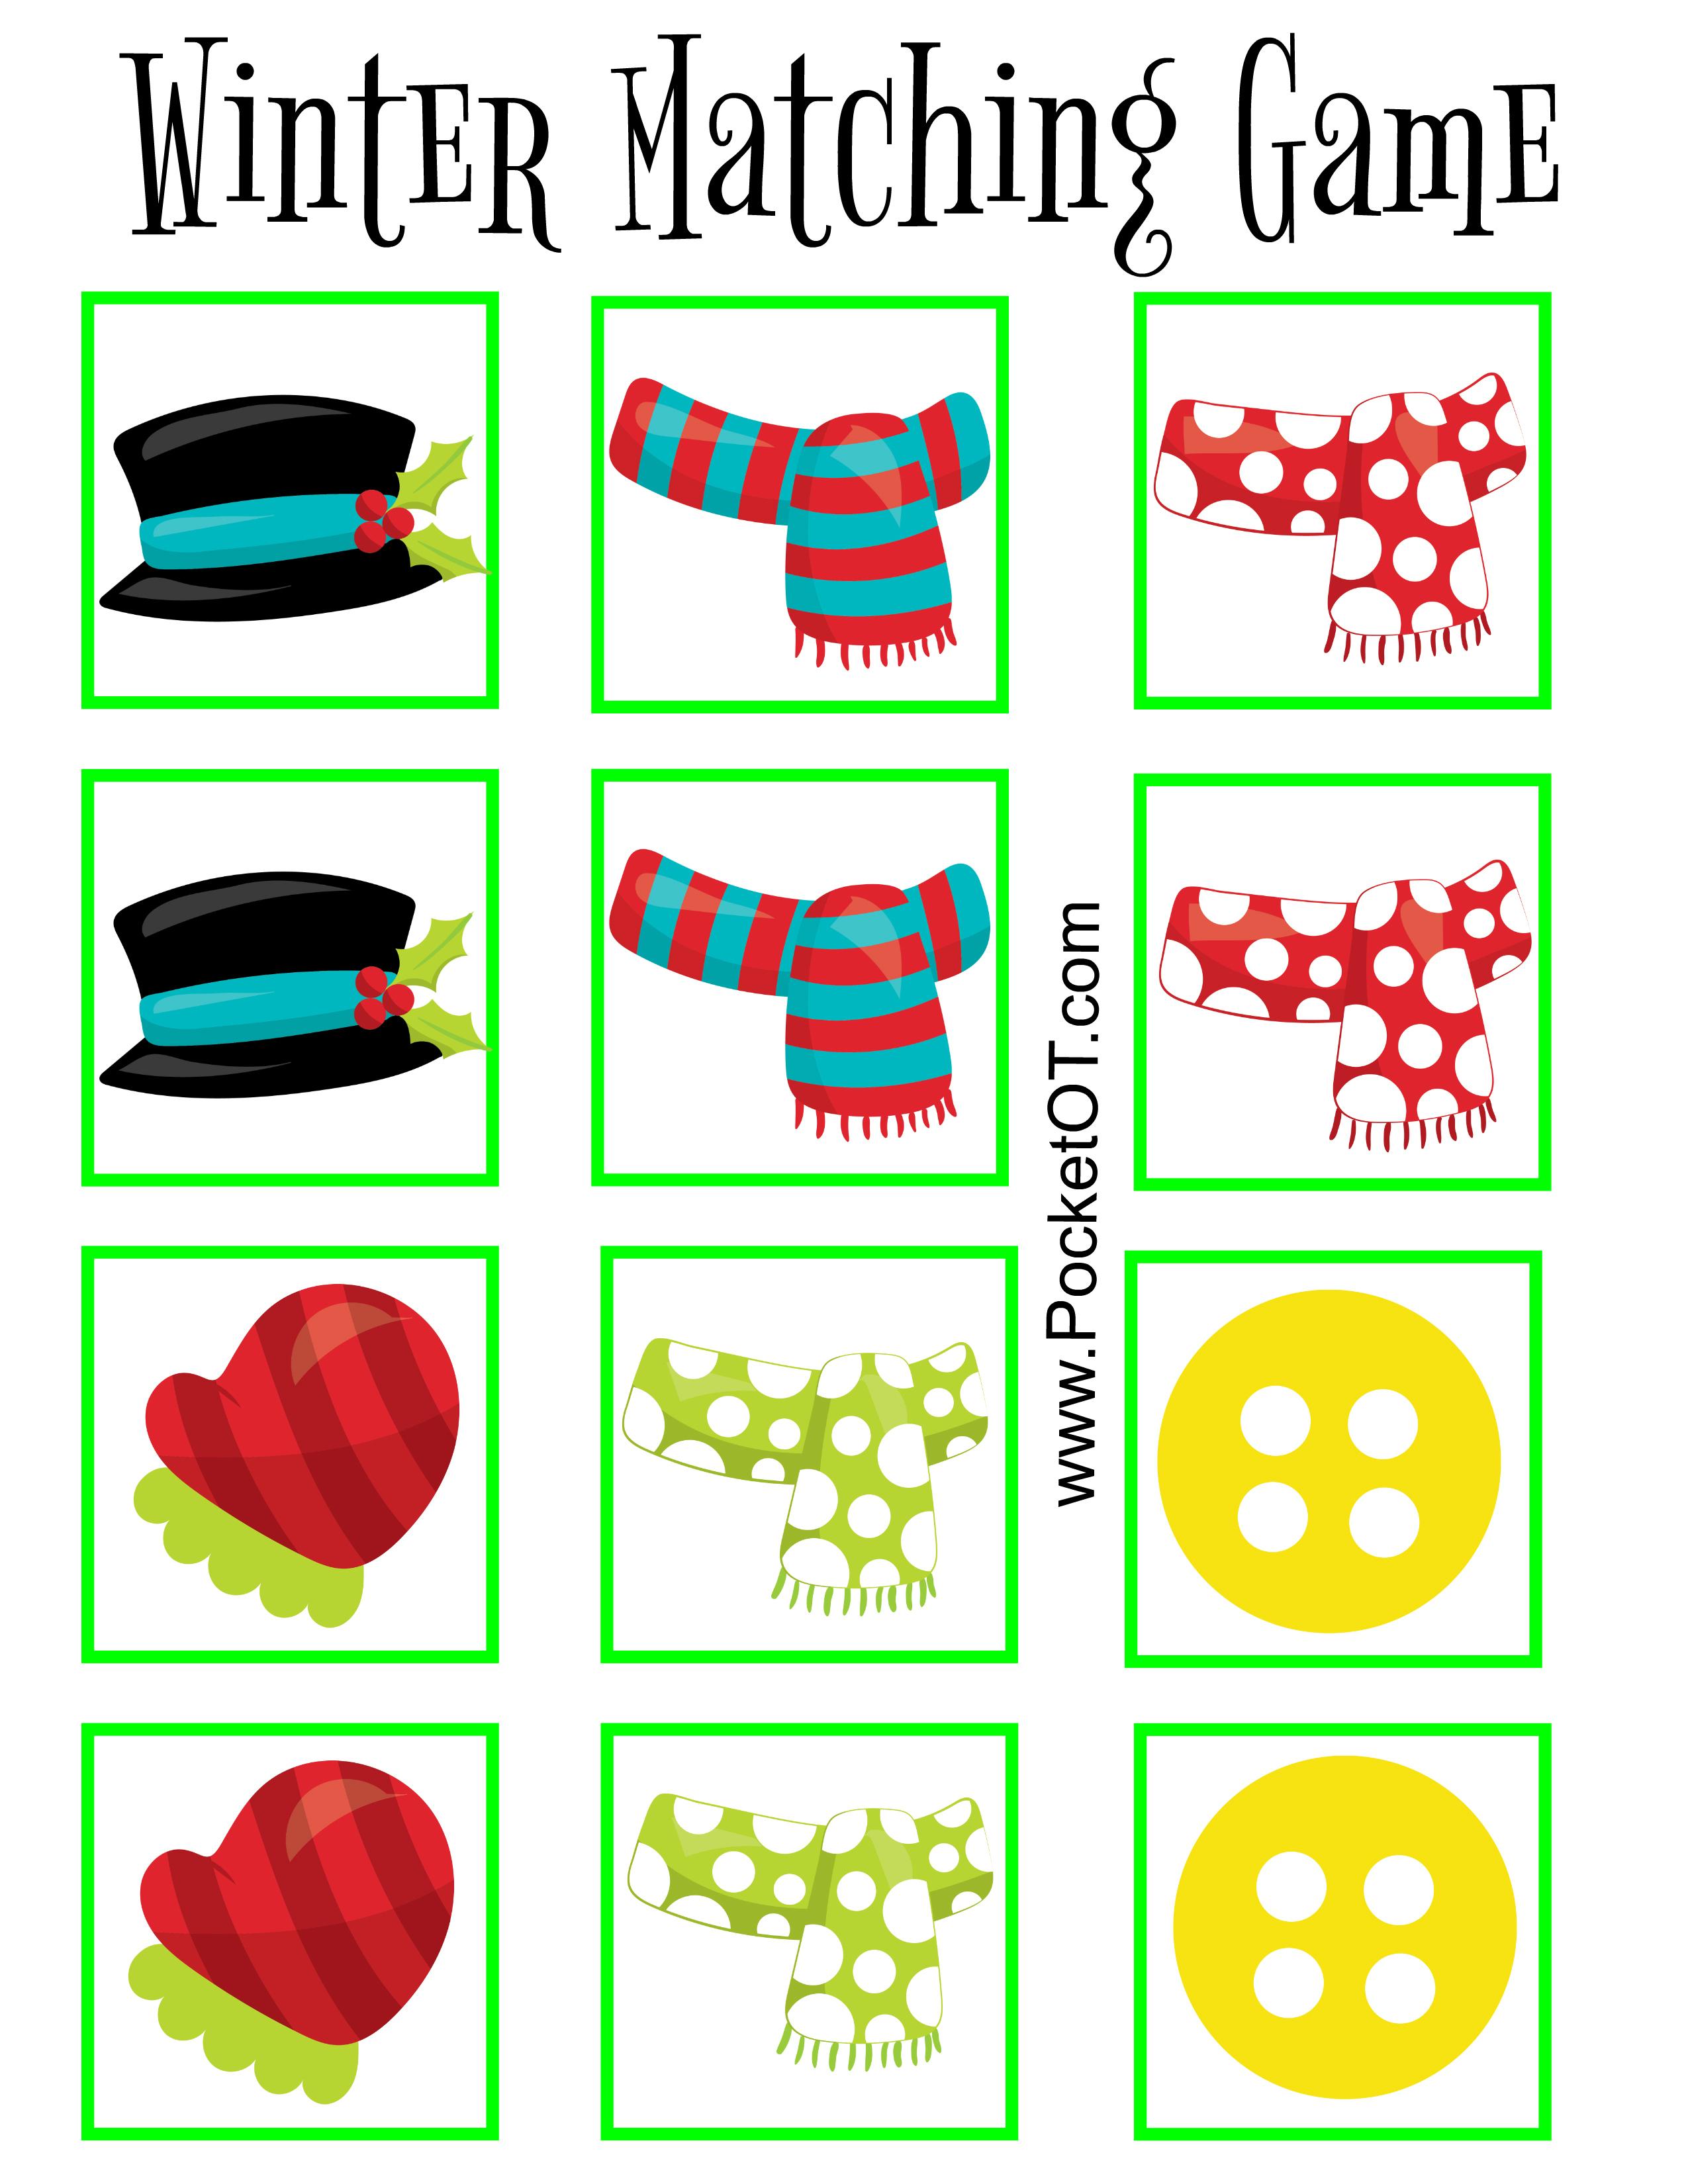 Winter Clothing Matching Game